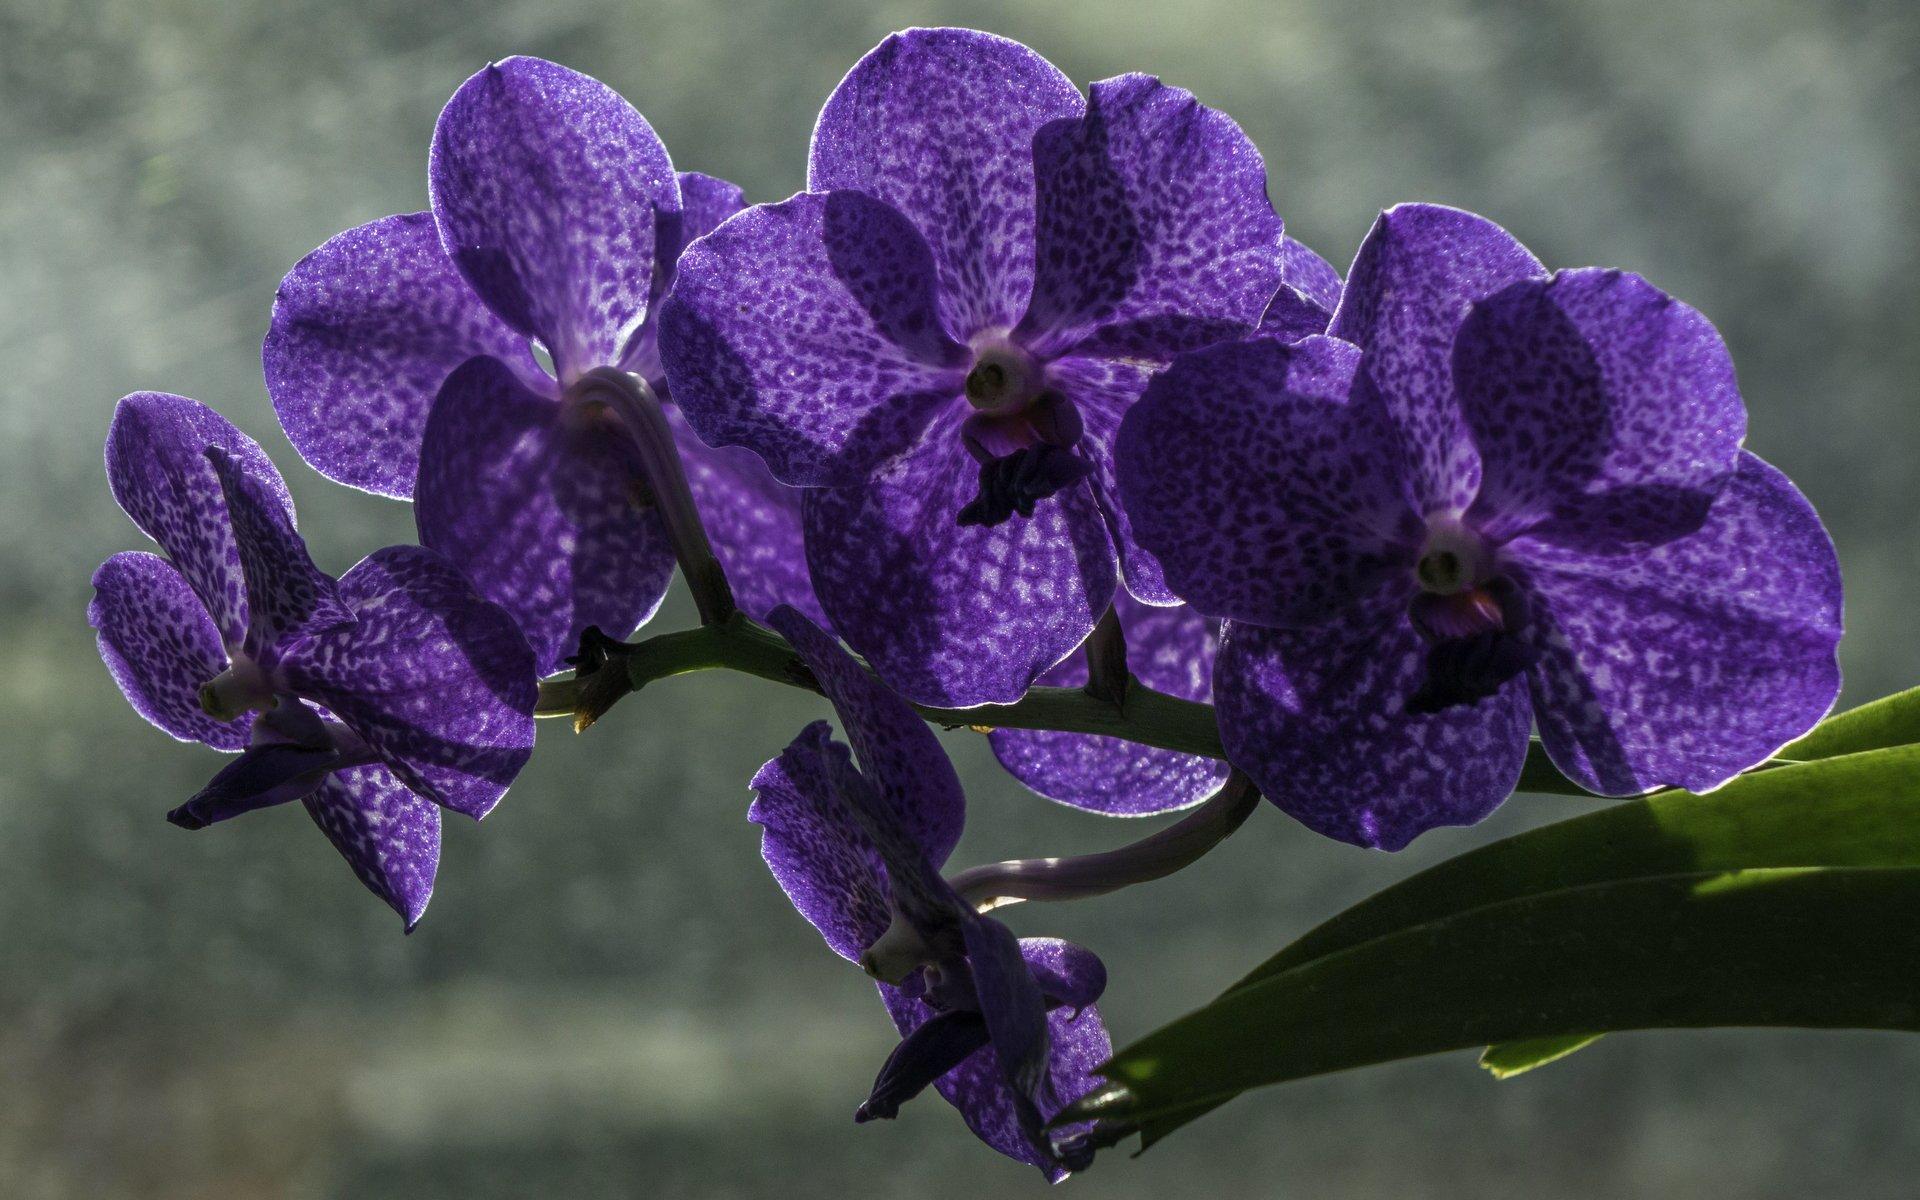 Orchidee im Orchideenhaus des Berggartens